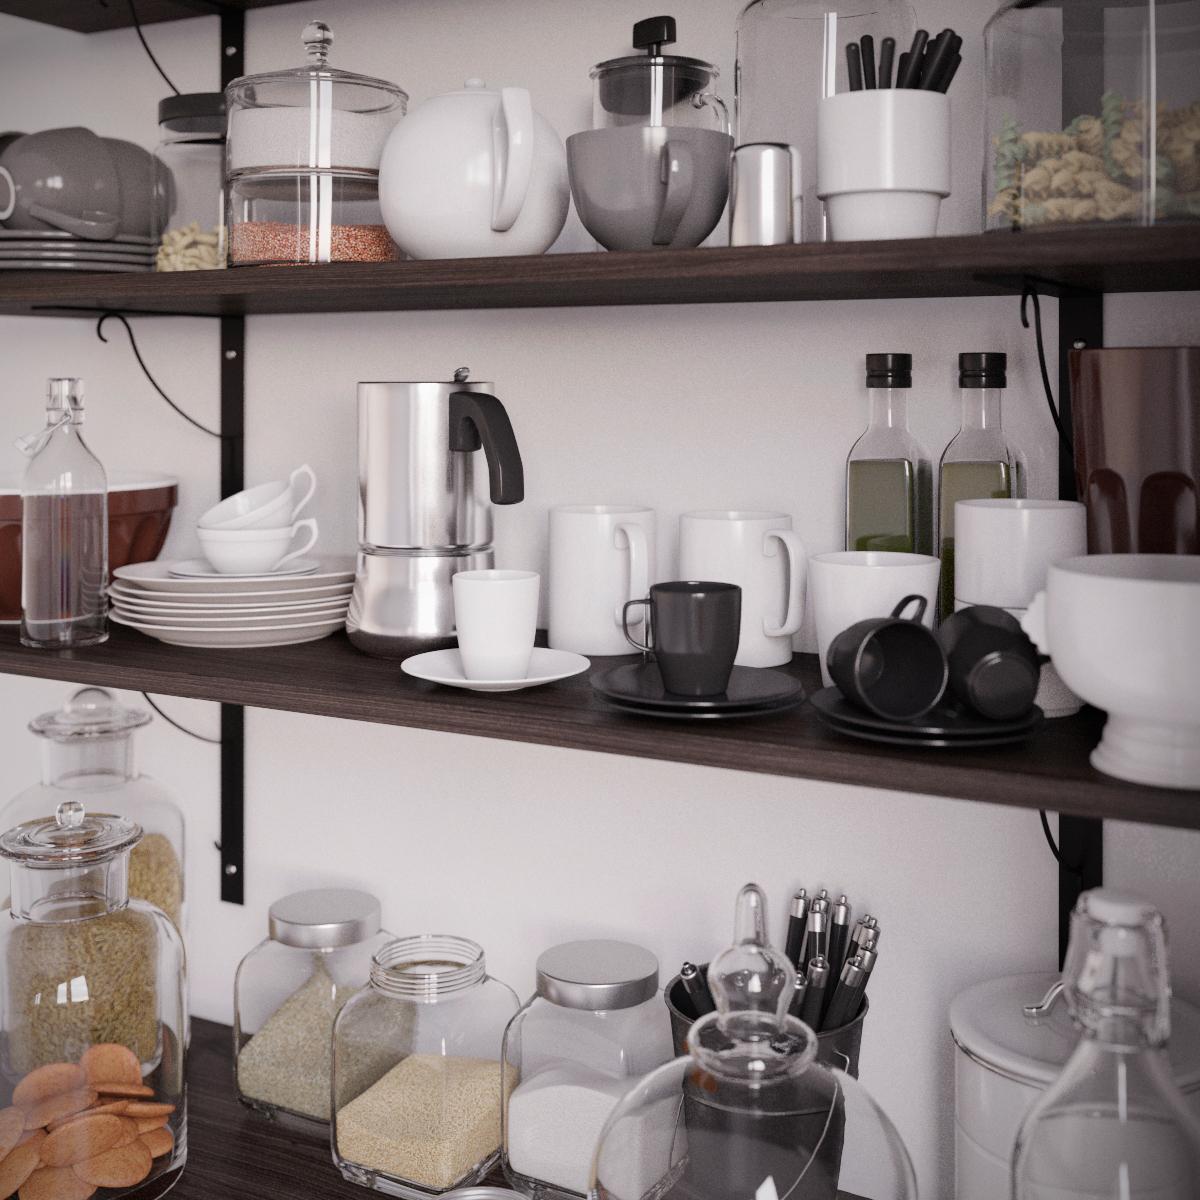 kitchen CGI 3dsmax corona rendering kitchen set